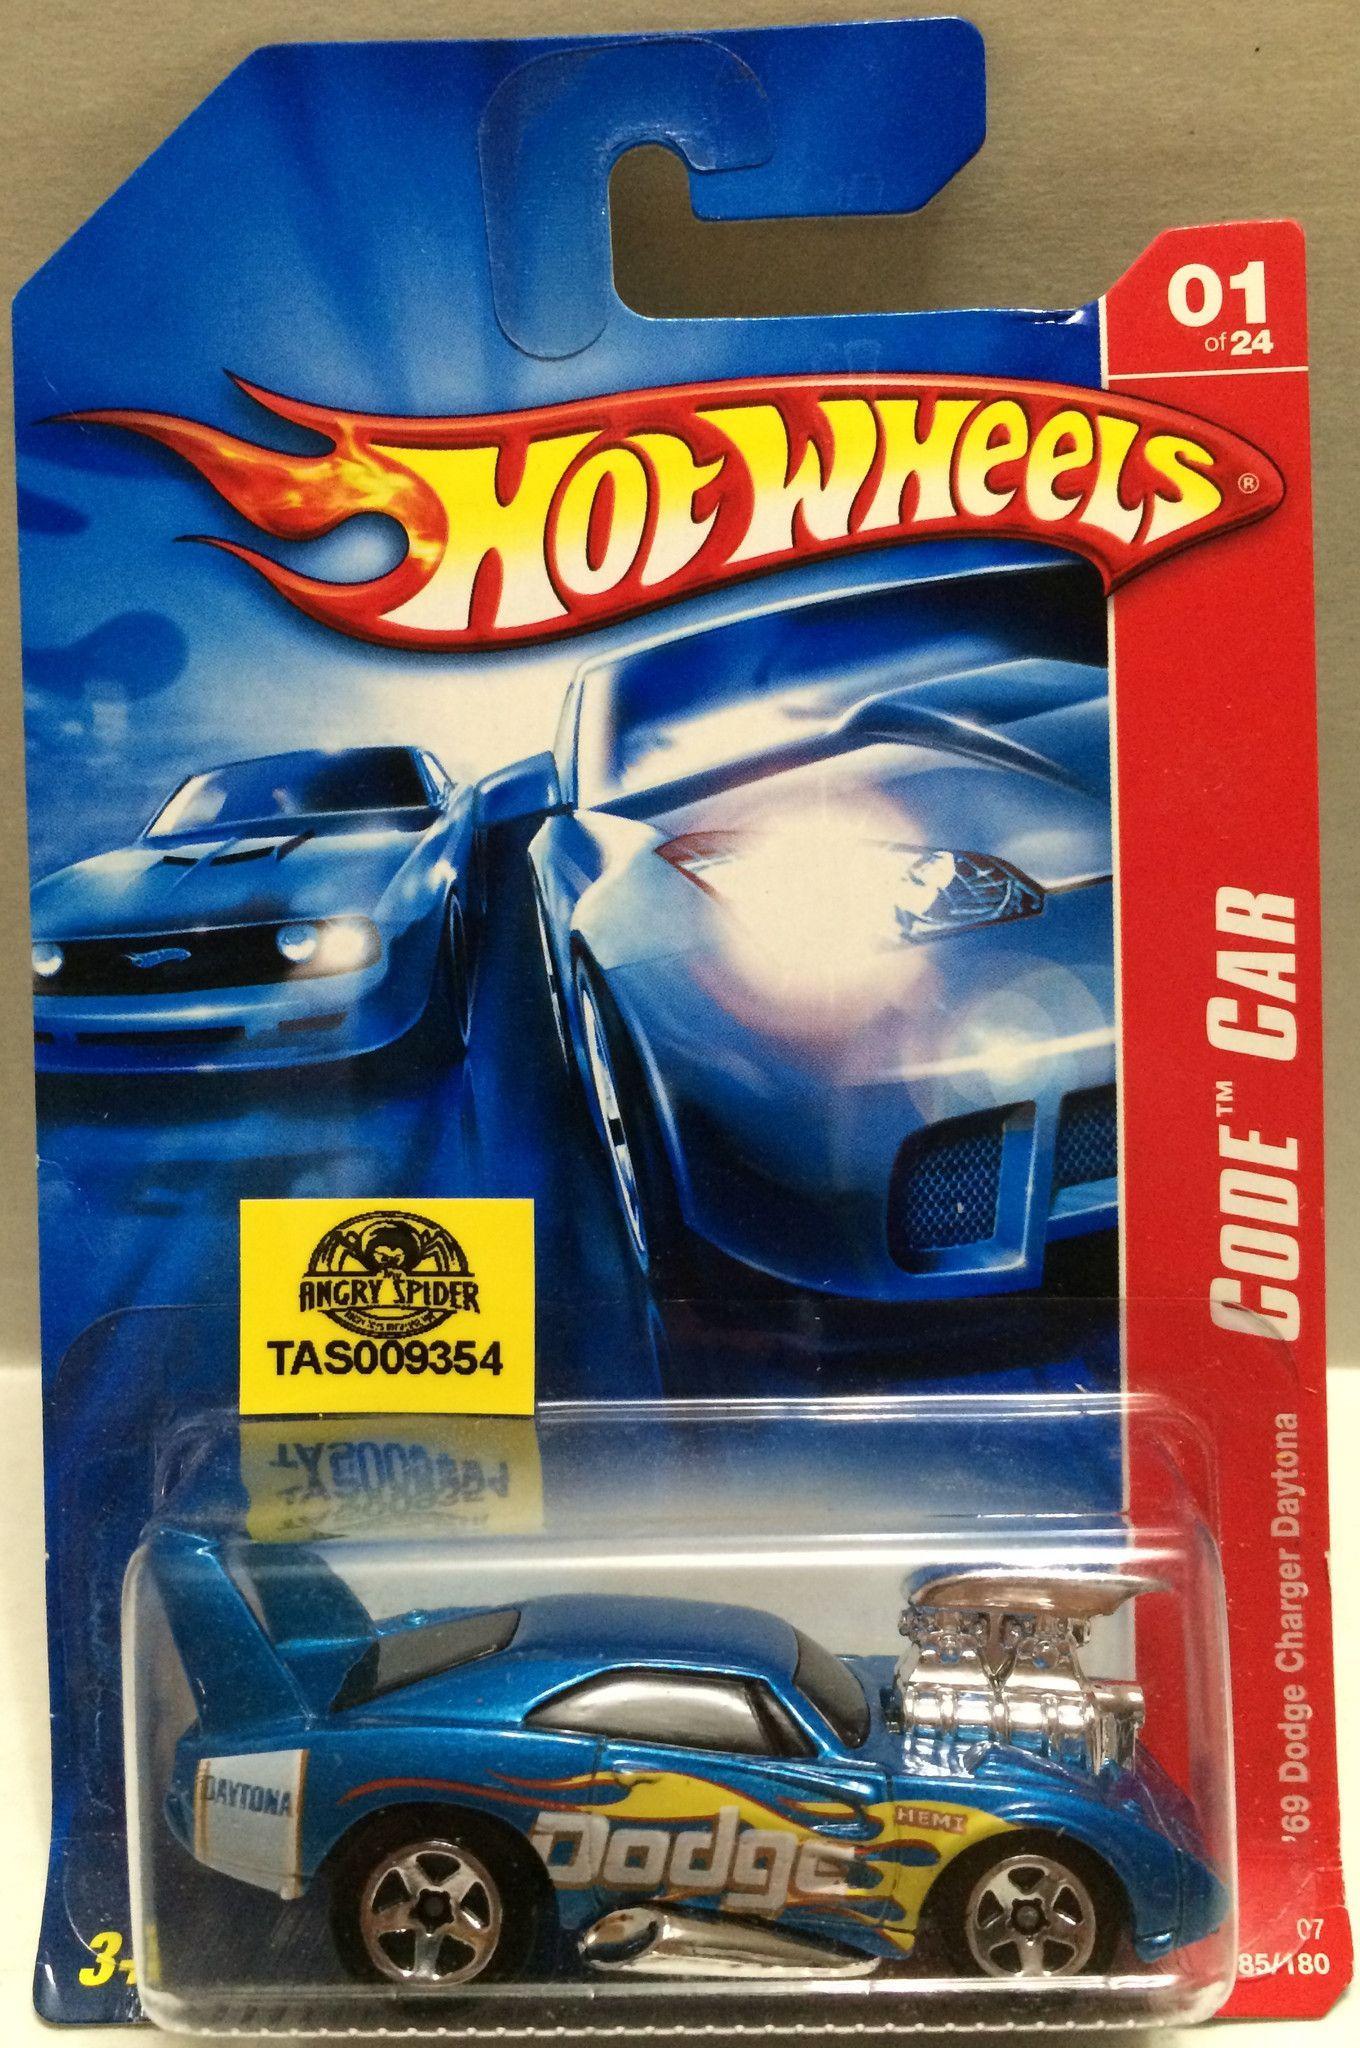 Tas009354 Hot Wheels Die Cast 69 Dodge Charger Daytona Code Car